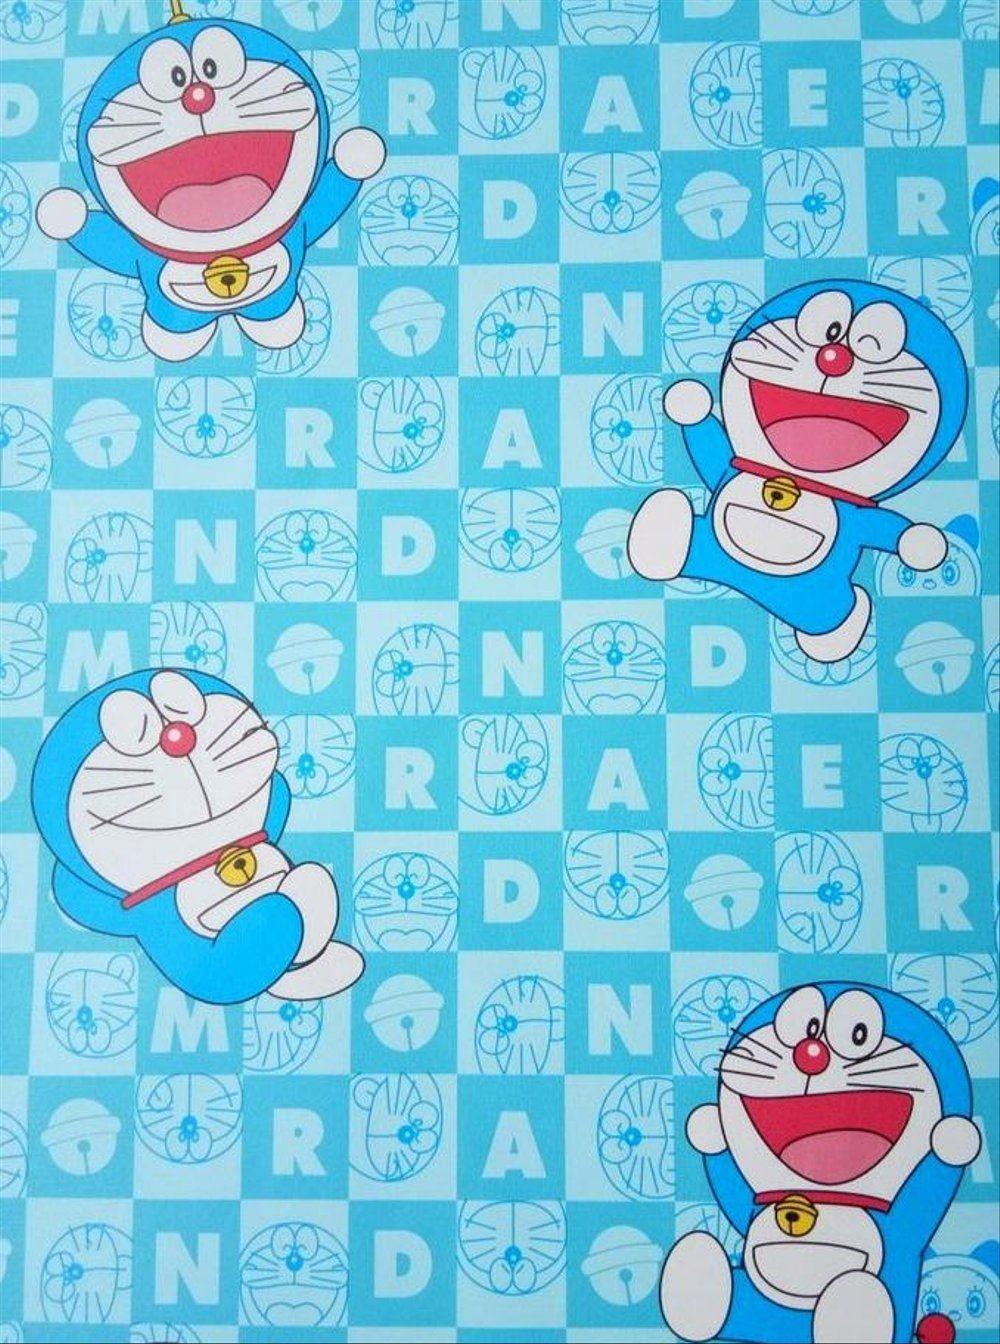 Doraemon Kotak Hd Wallpaper Backgrounds Download